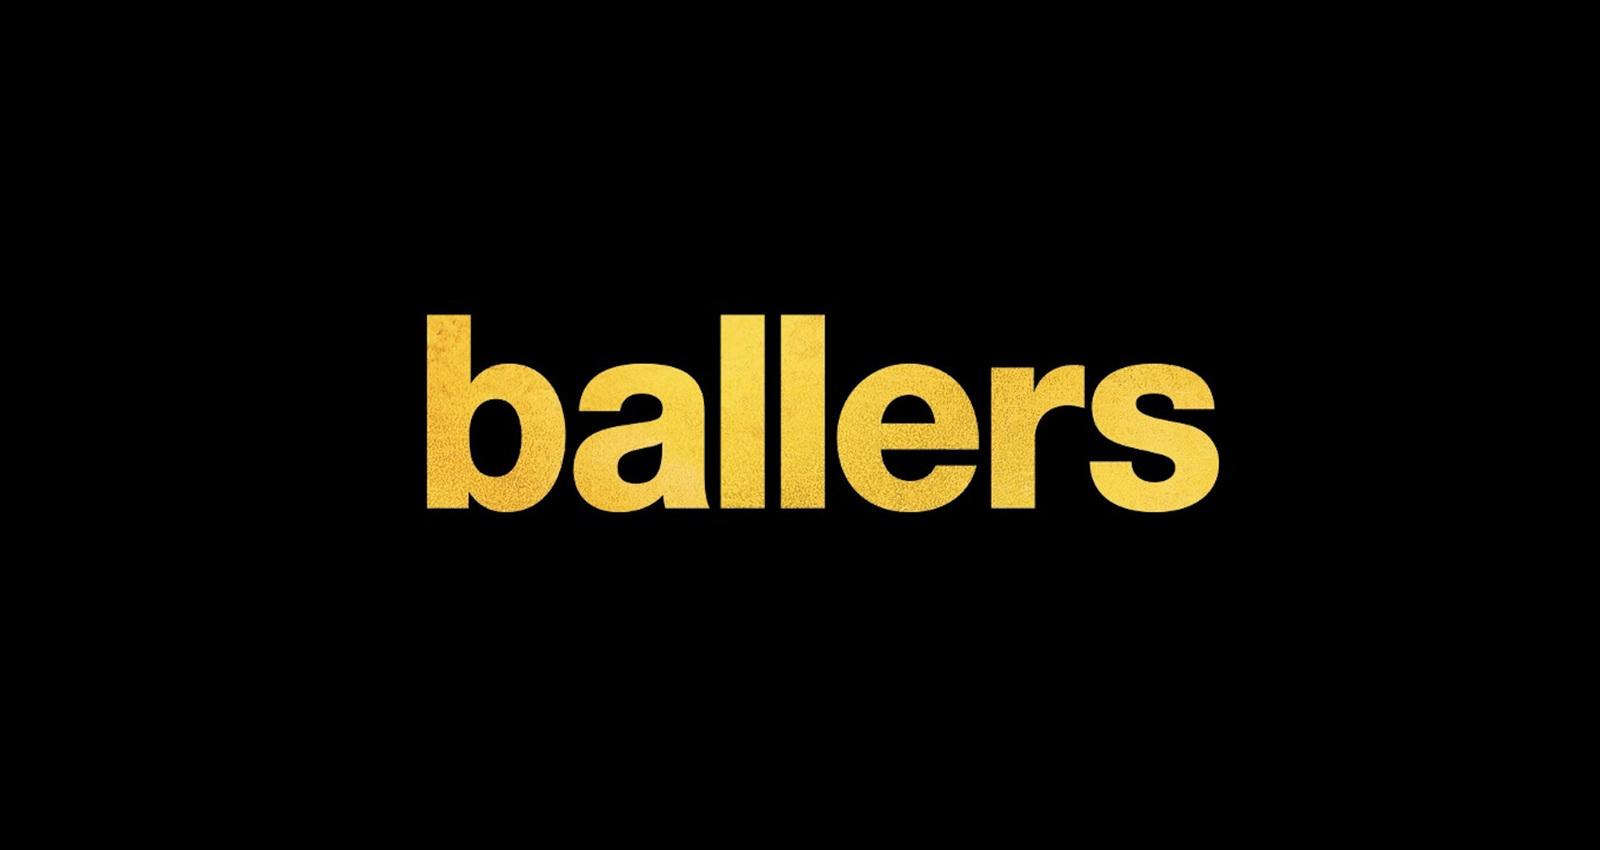 #BallersIntroContest